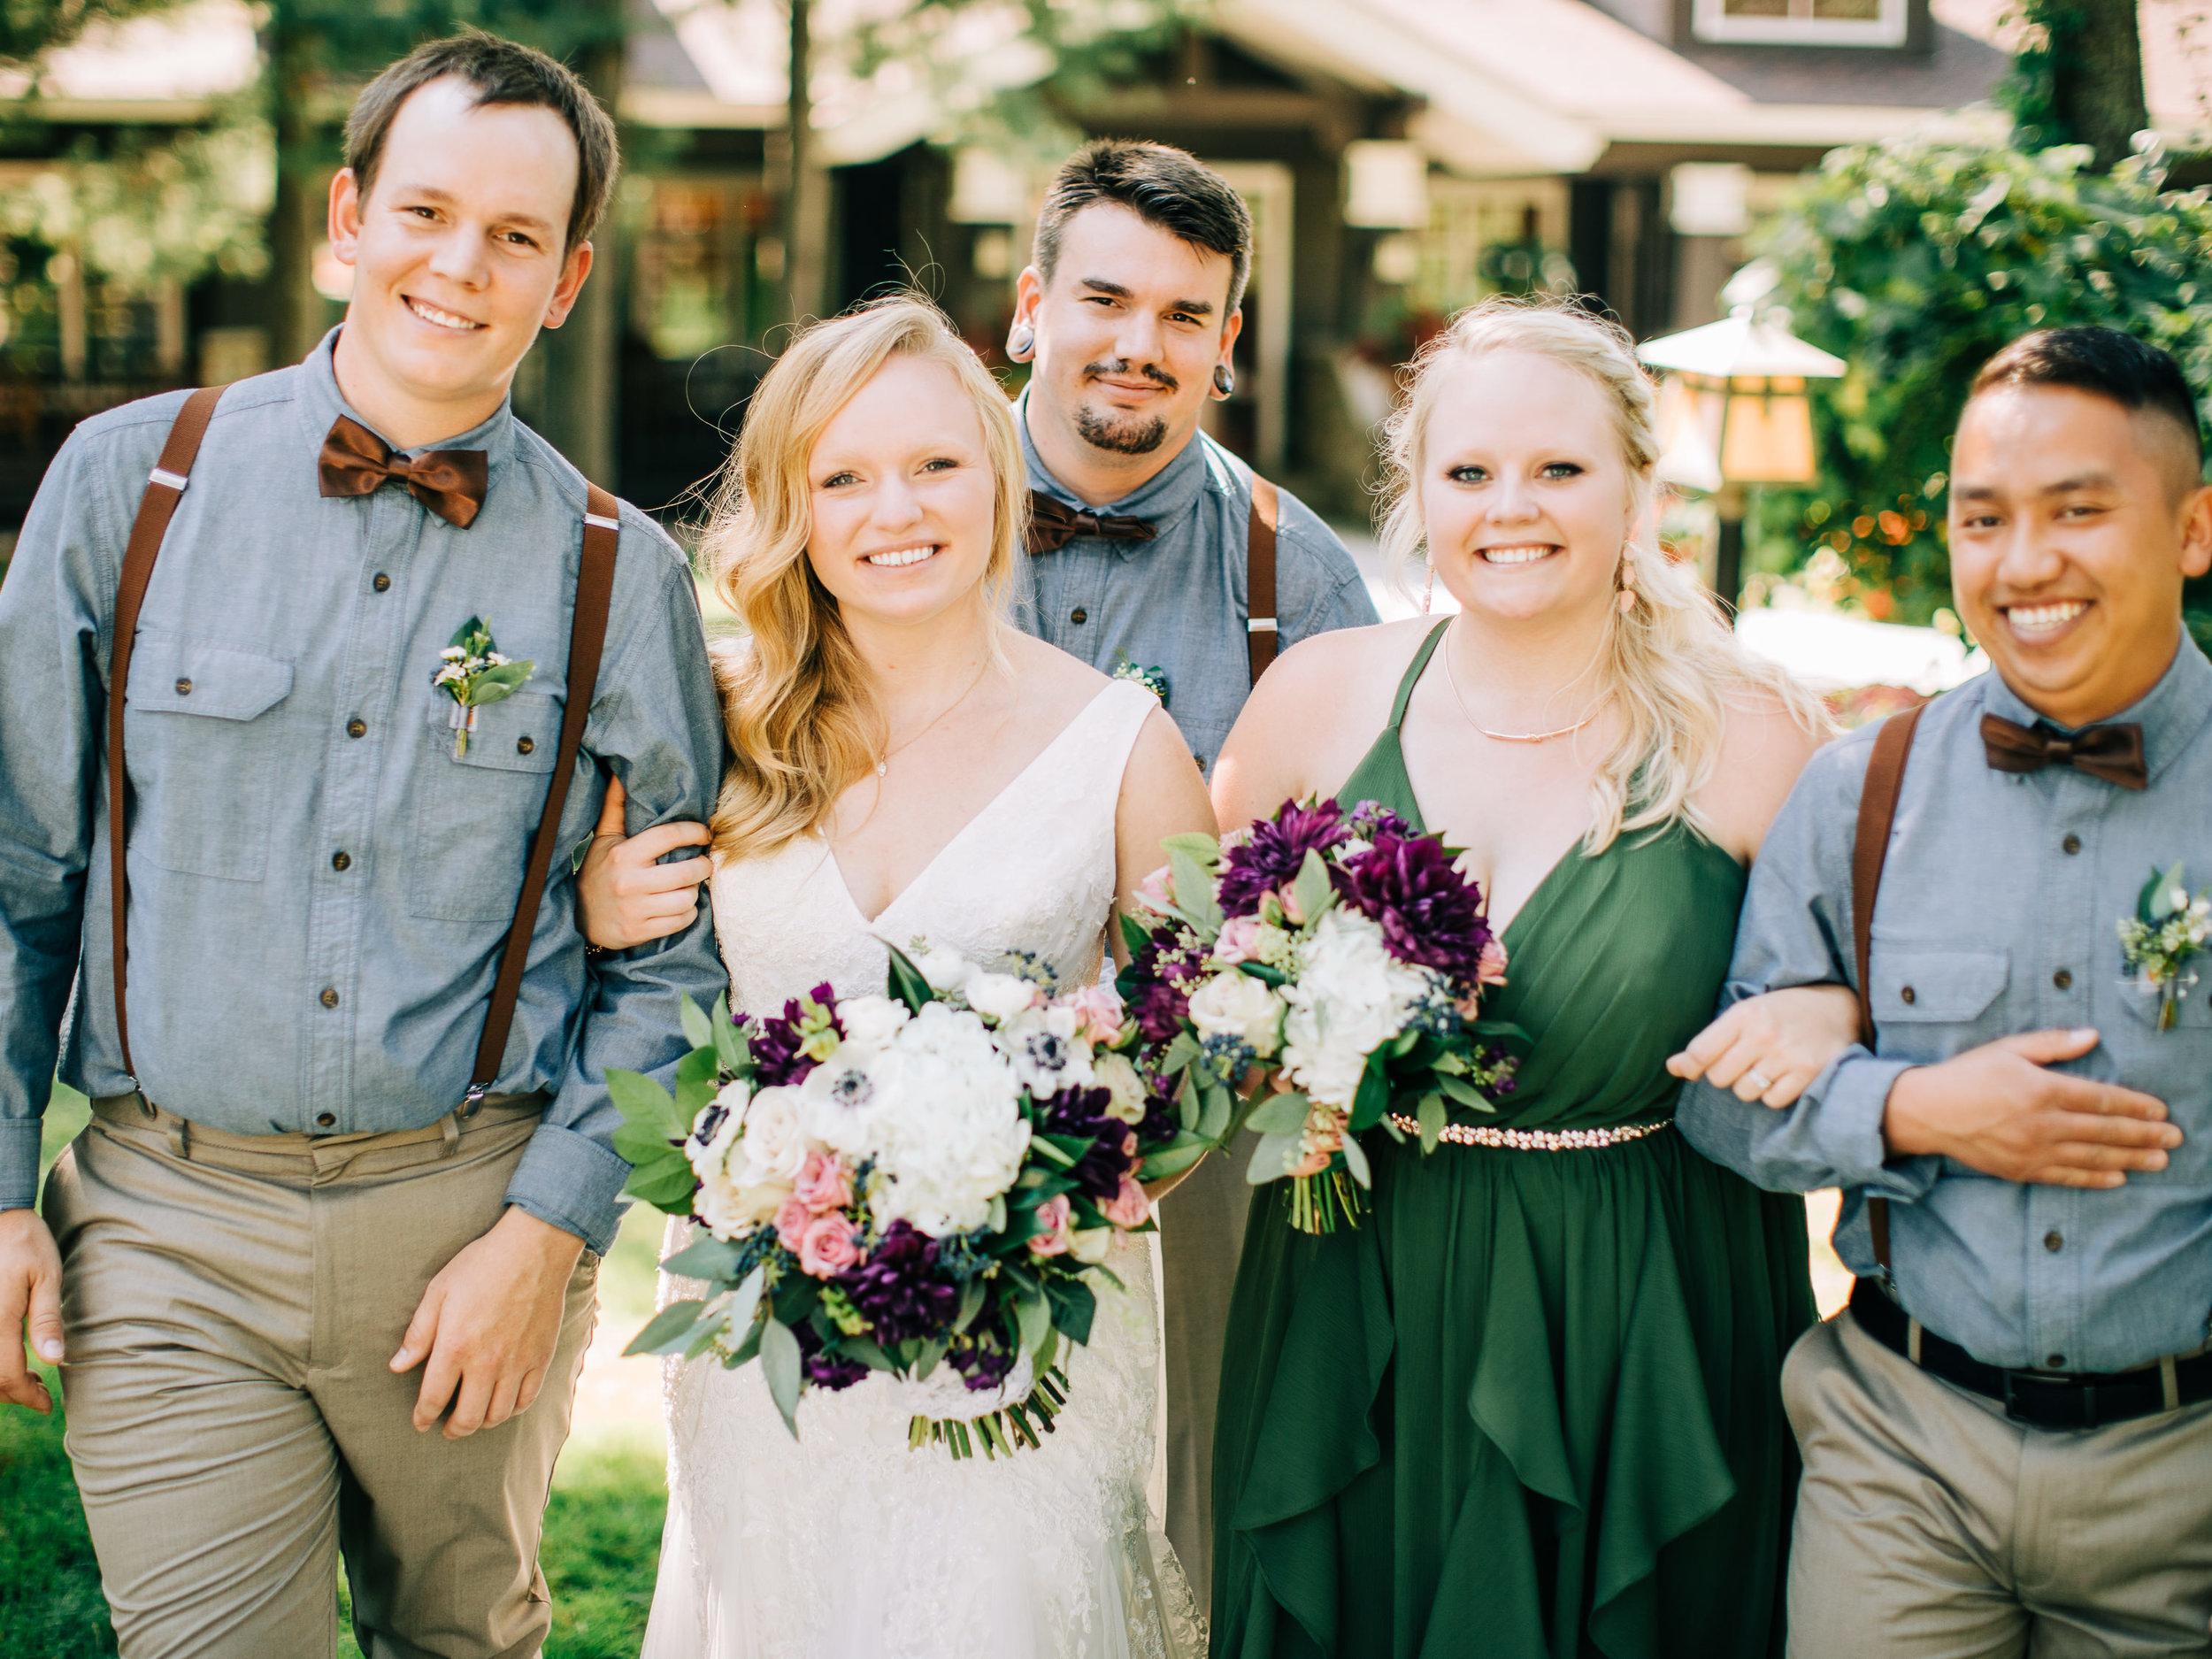 Grand_View_Lodge_Wedding_in_Nisswa_on_Gull_Lake